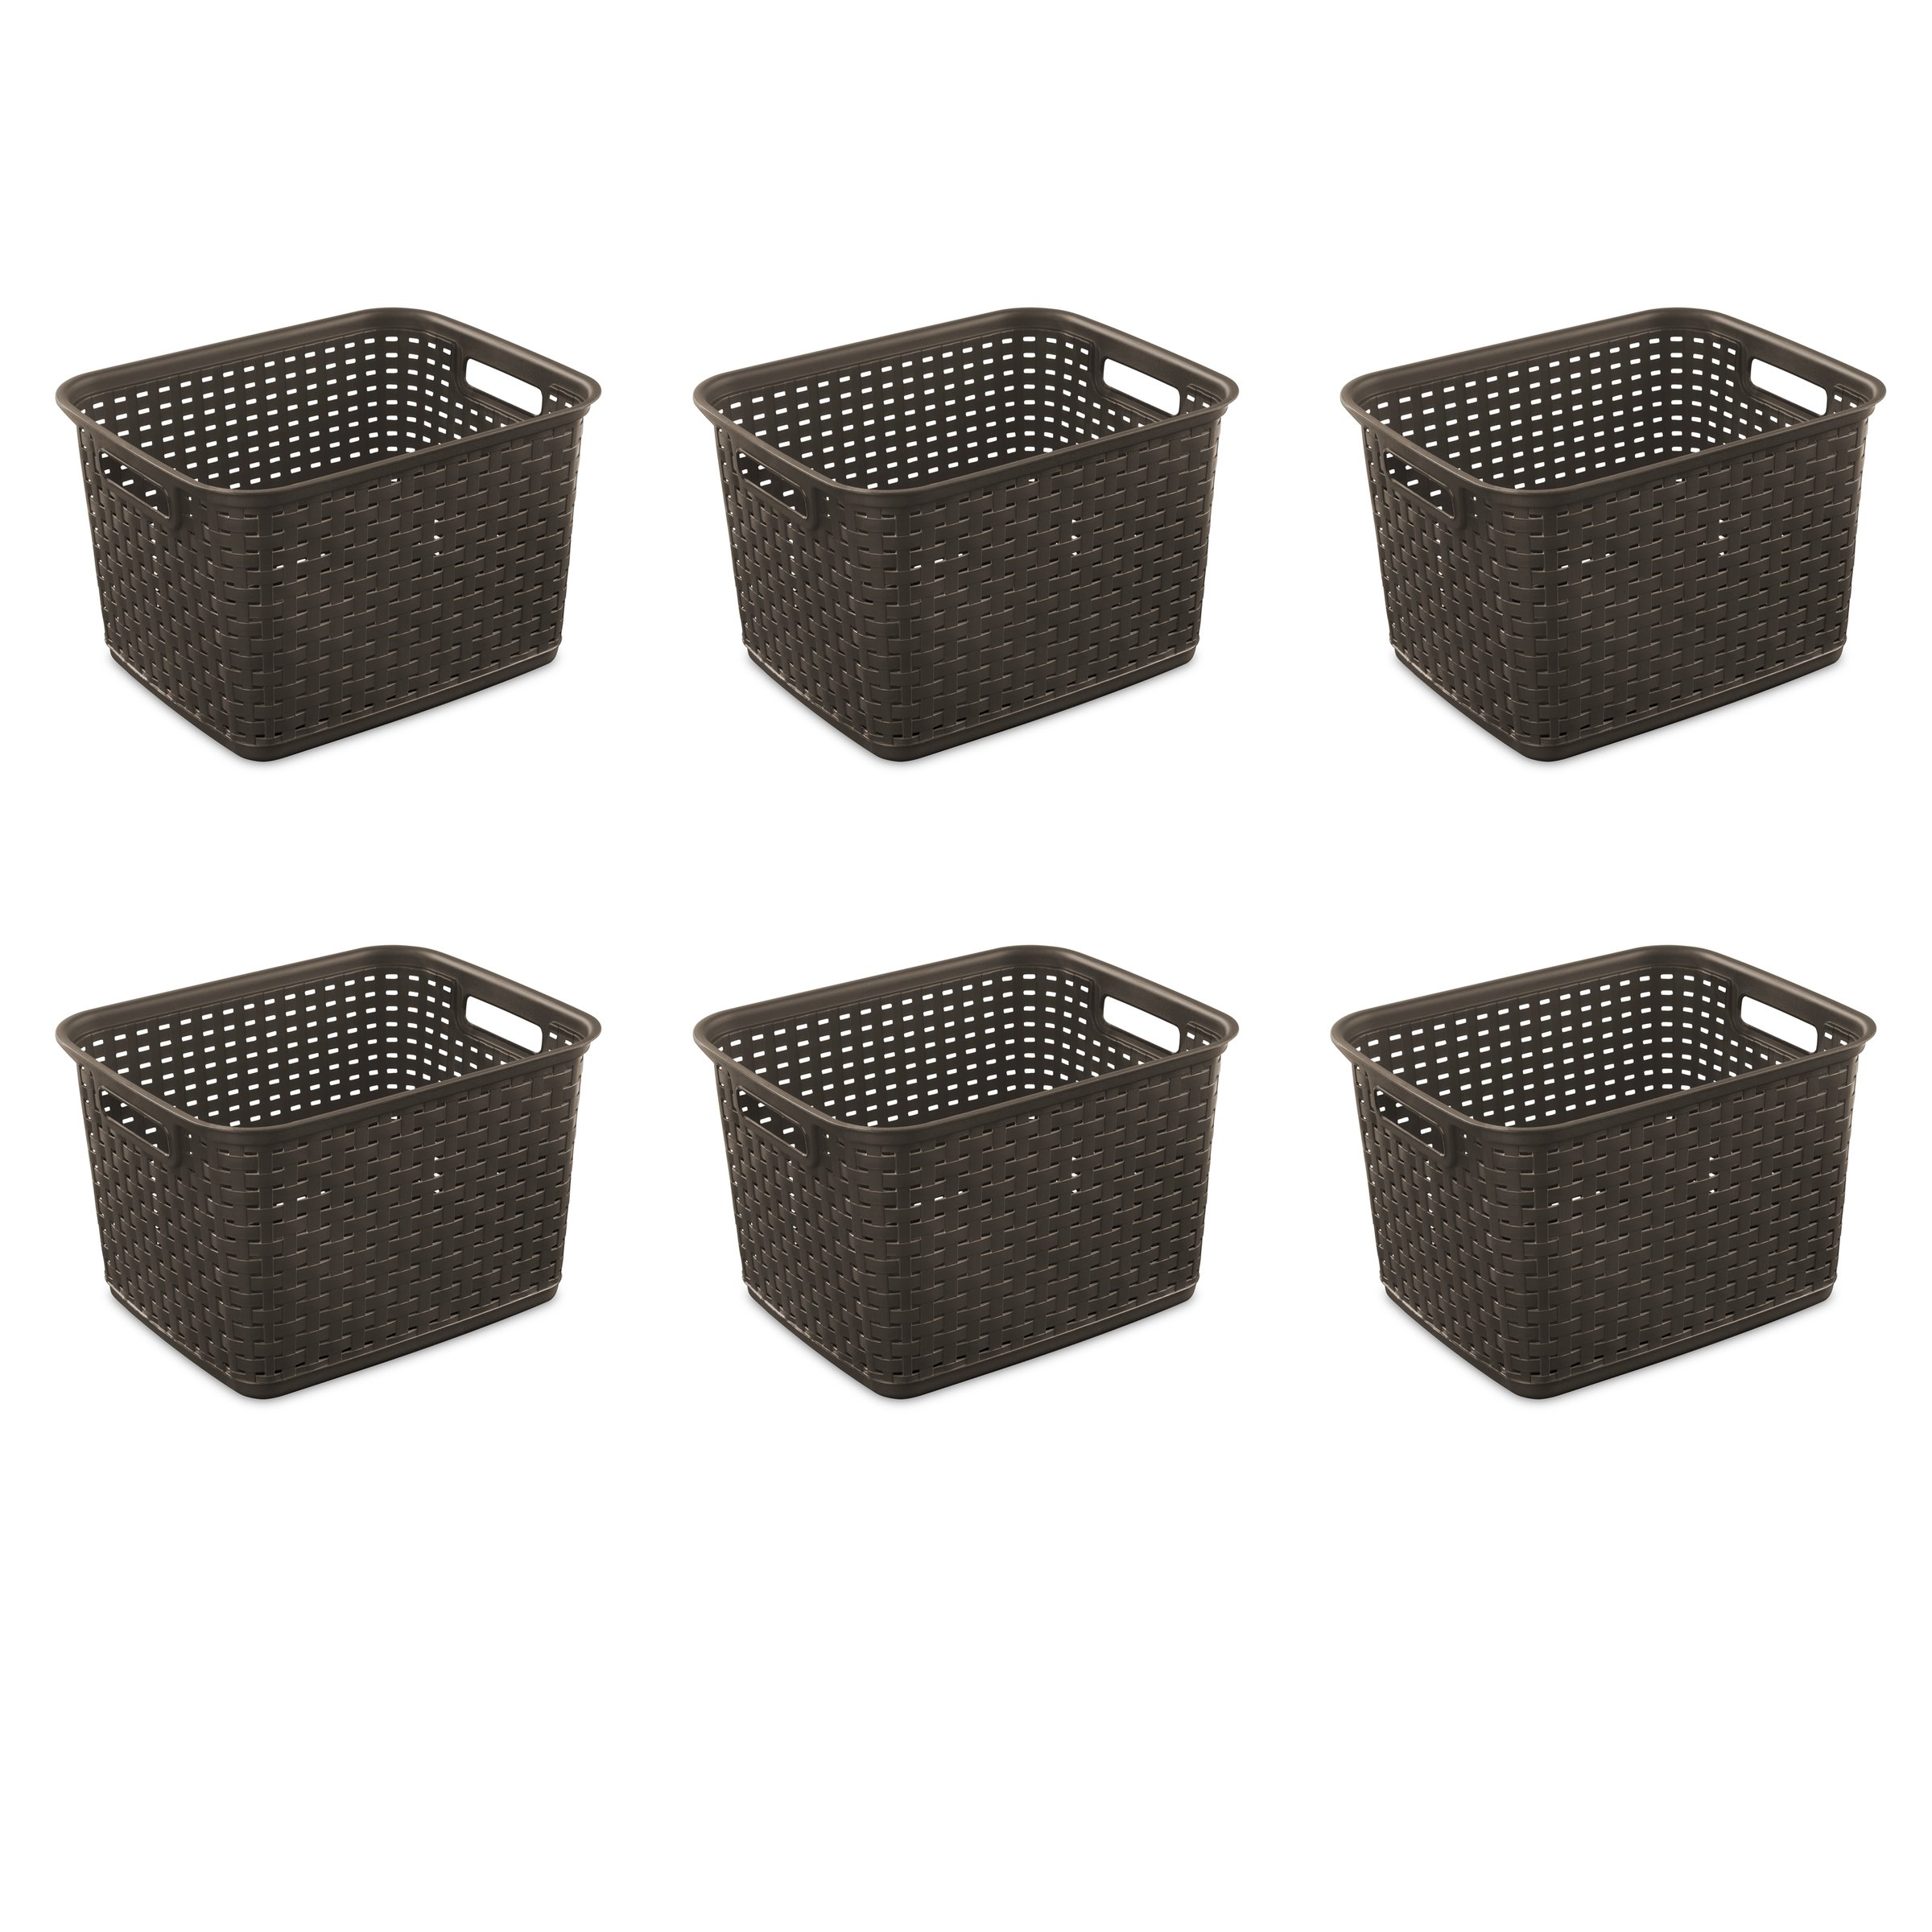 Sterilite 12736P06 Tall Weave Basket, Espresso, 6-Pack by STERILITE